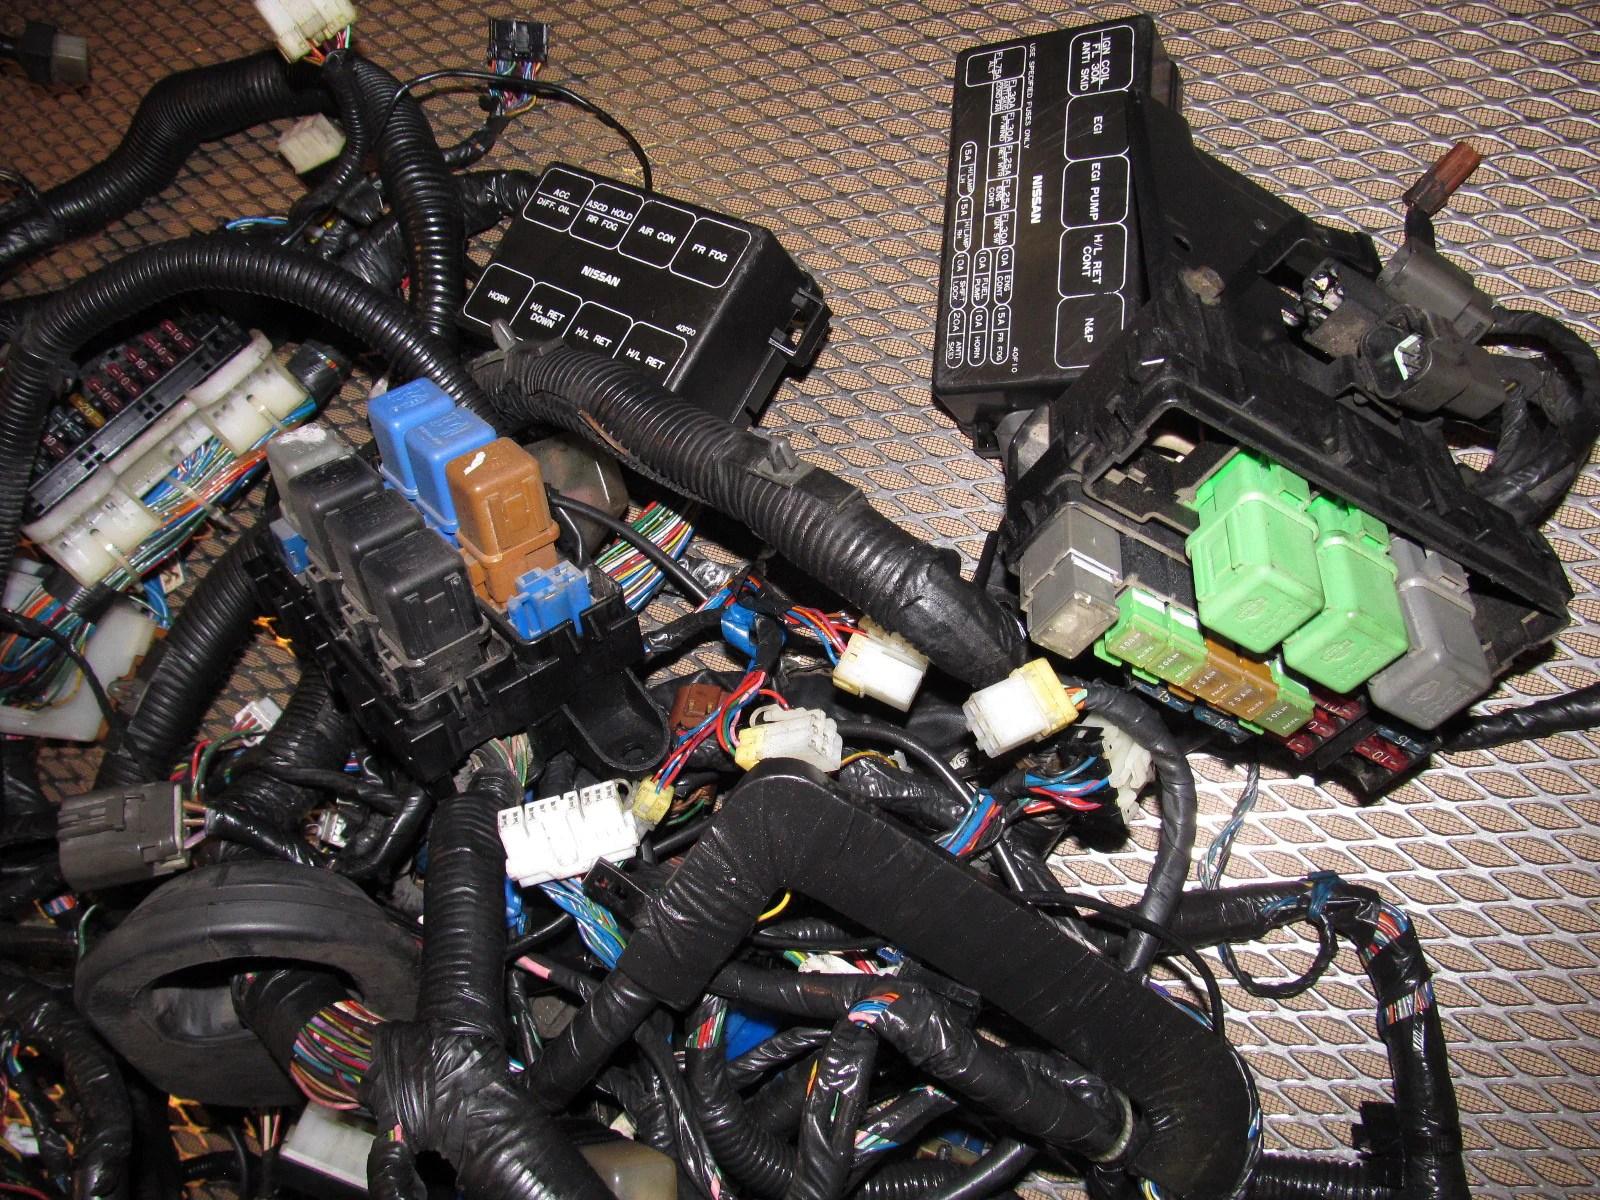 89 nissan 240sx radio wiring diagram whole house audio system sohc fuse box